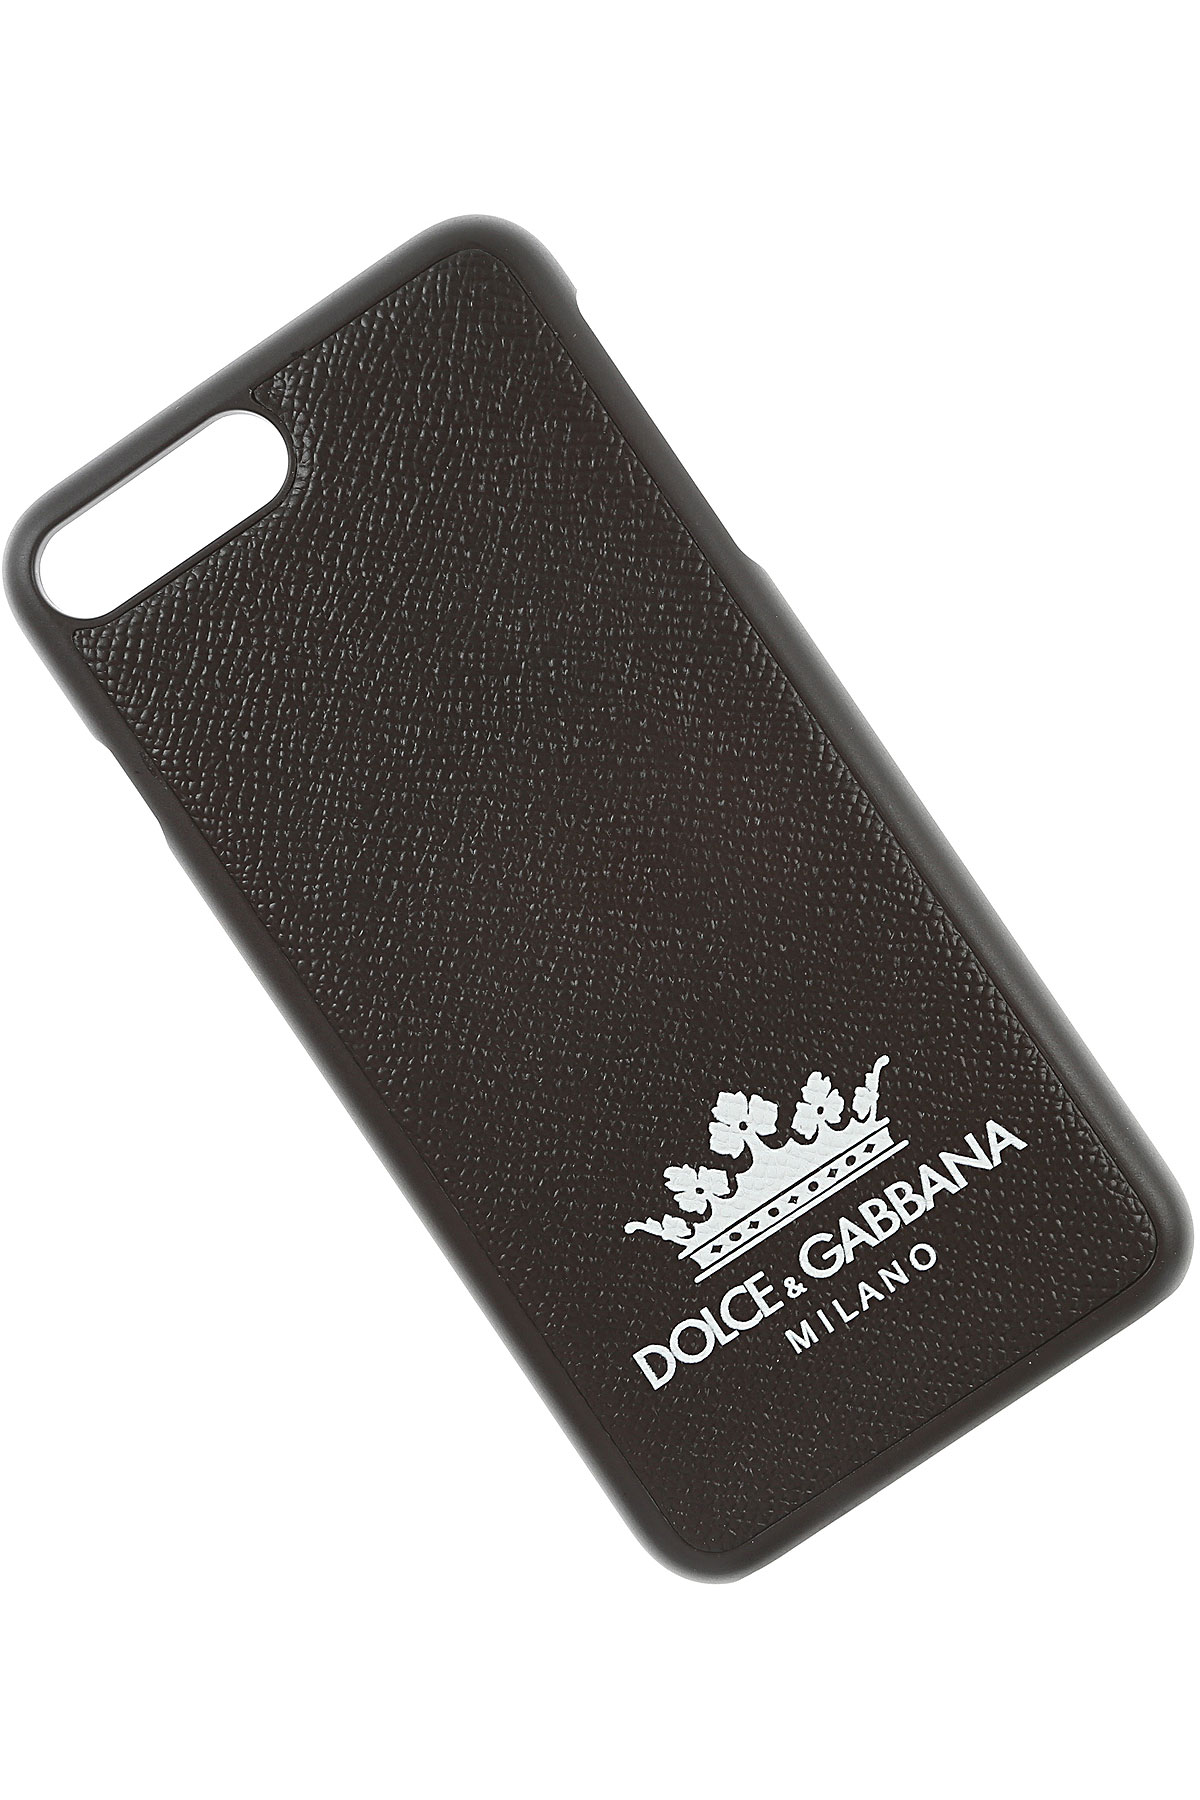 Image of Dolce & Gabbana iPhone Cases, I Phone Case 7 Plus, Black, Leather, 2017